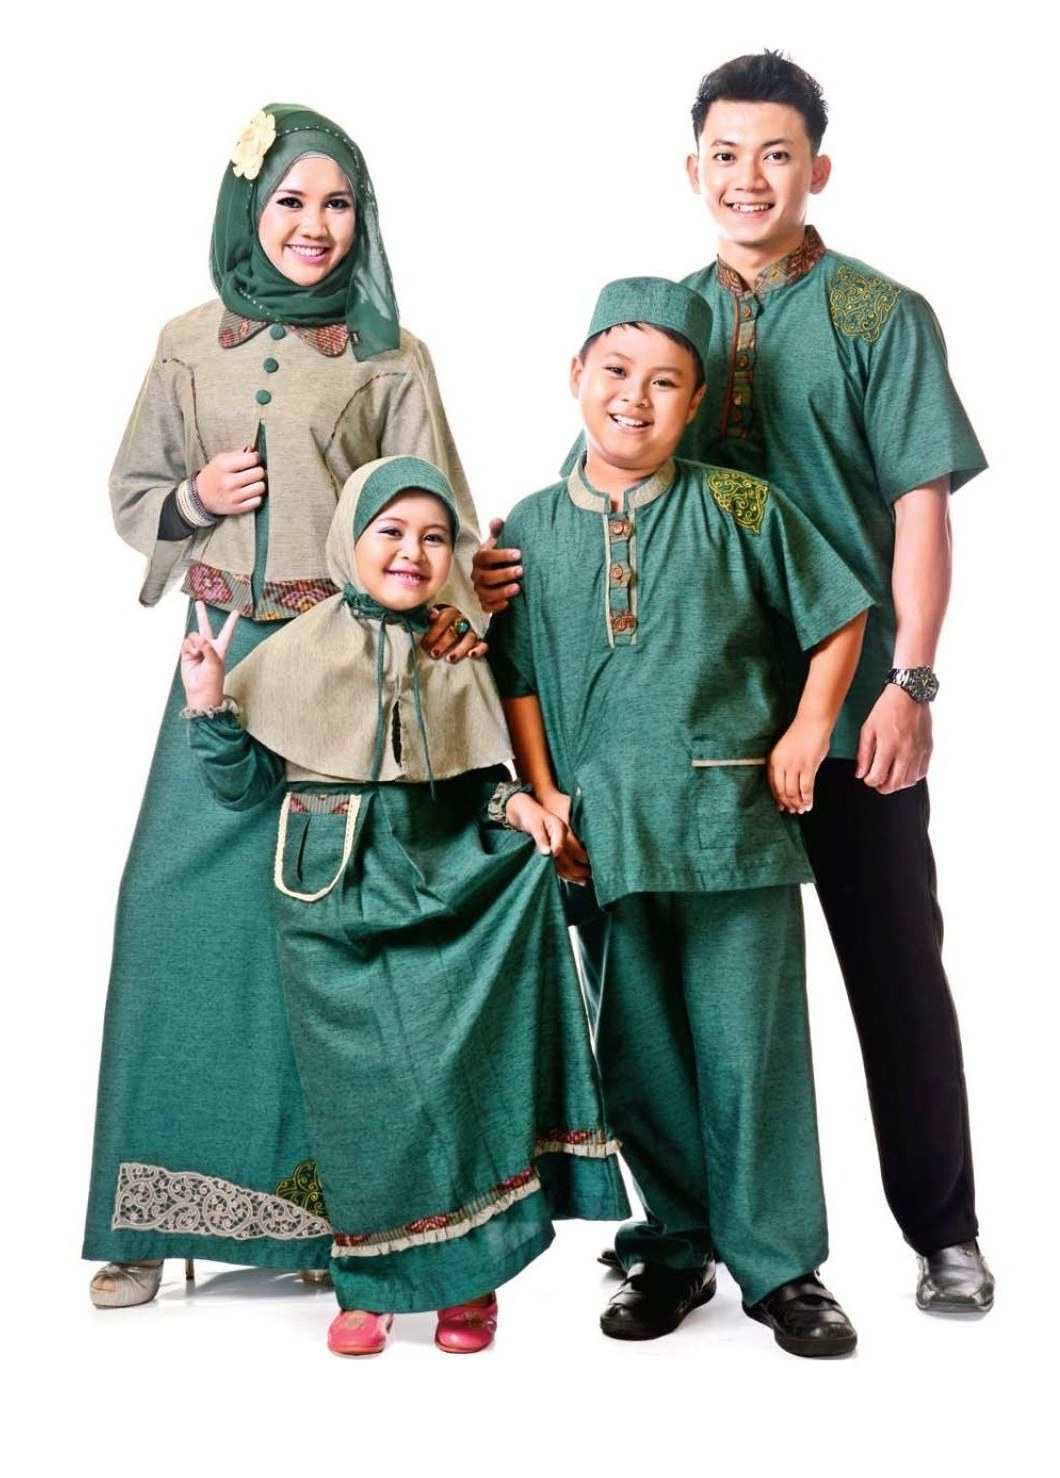 Design Model Baju Lebaran 2018 Keluarga Whdr Baju Lebaran Keluarga 2016